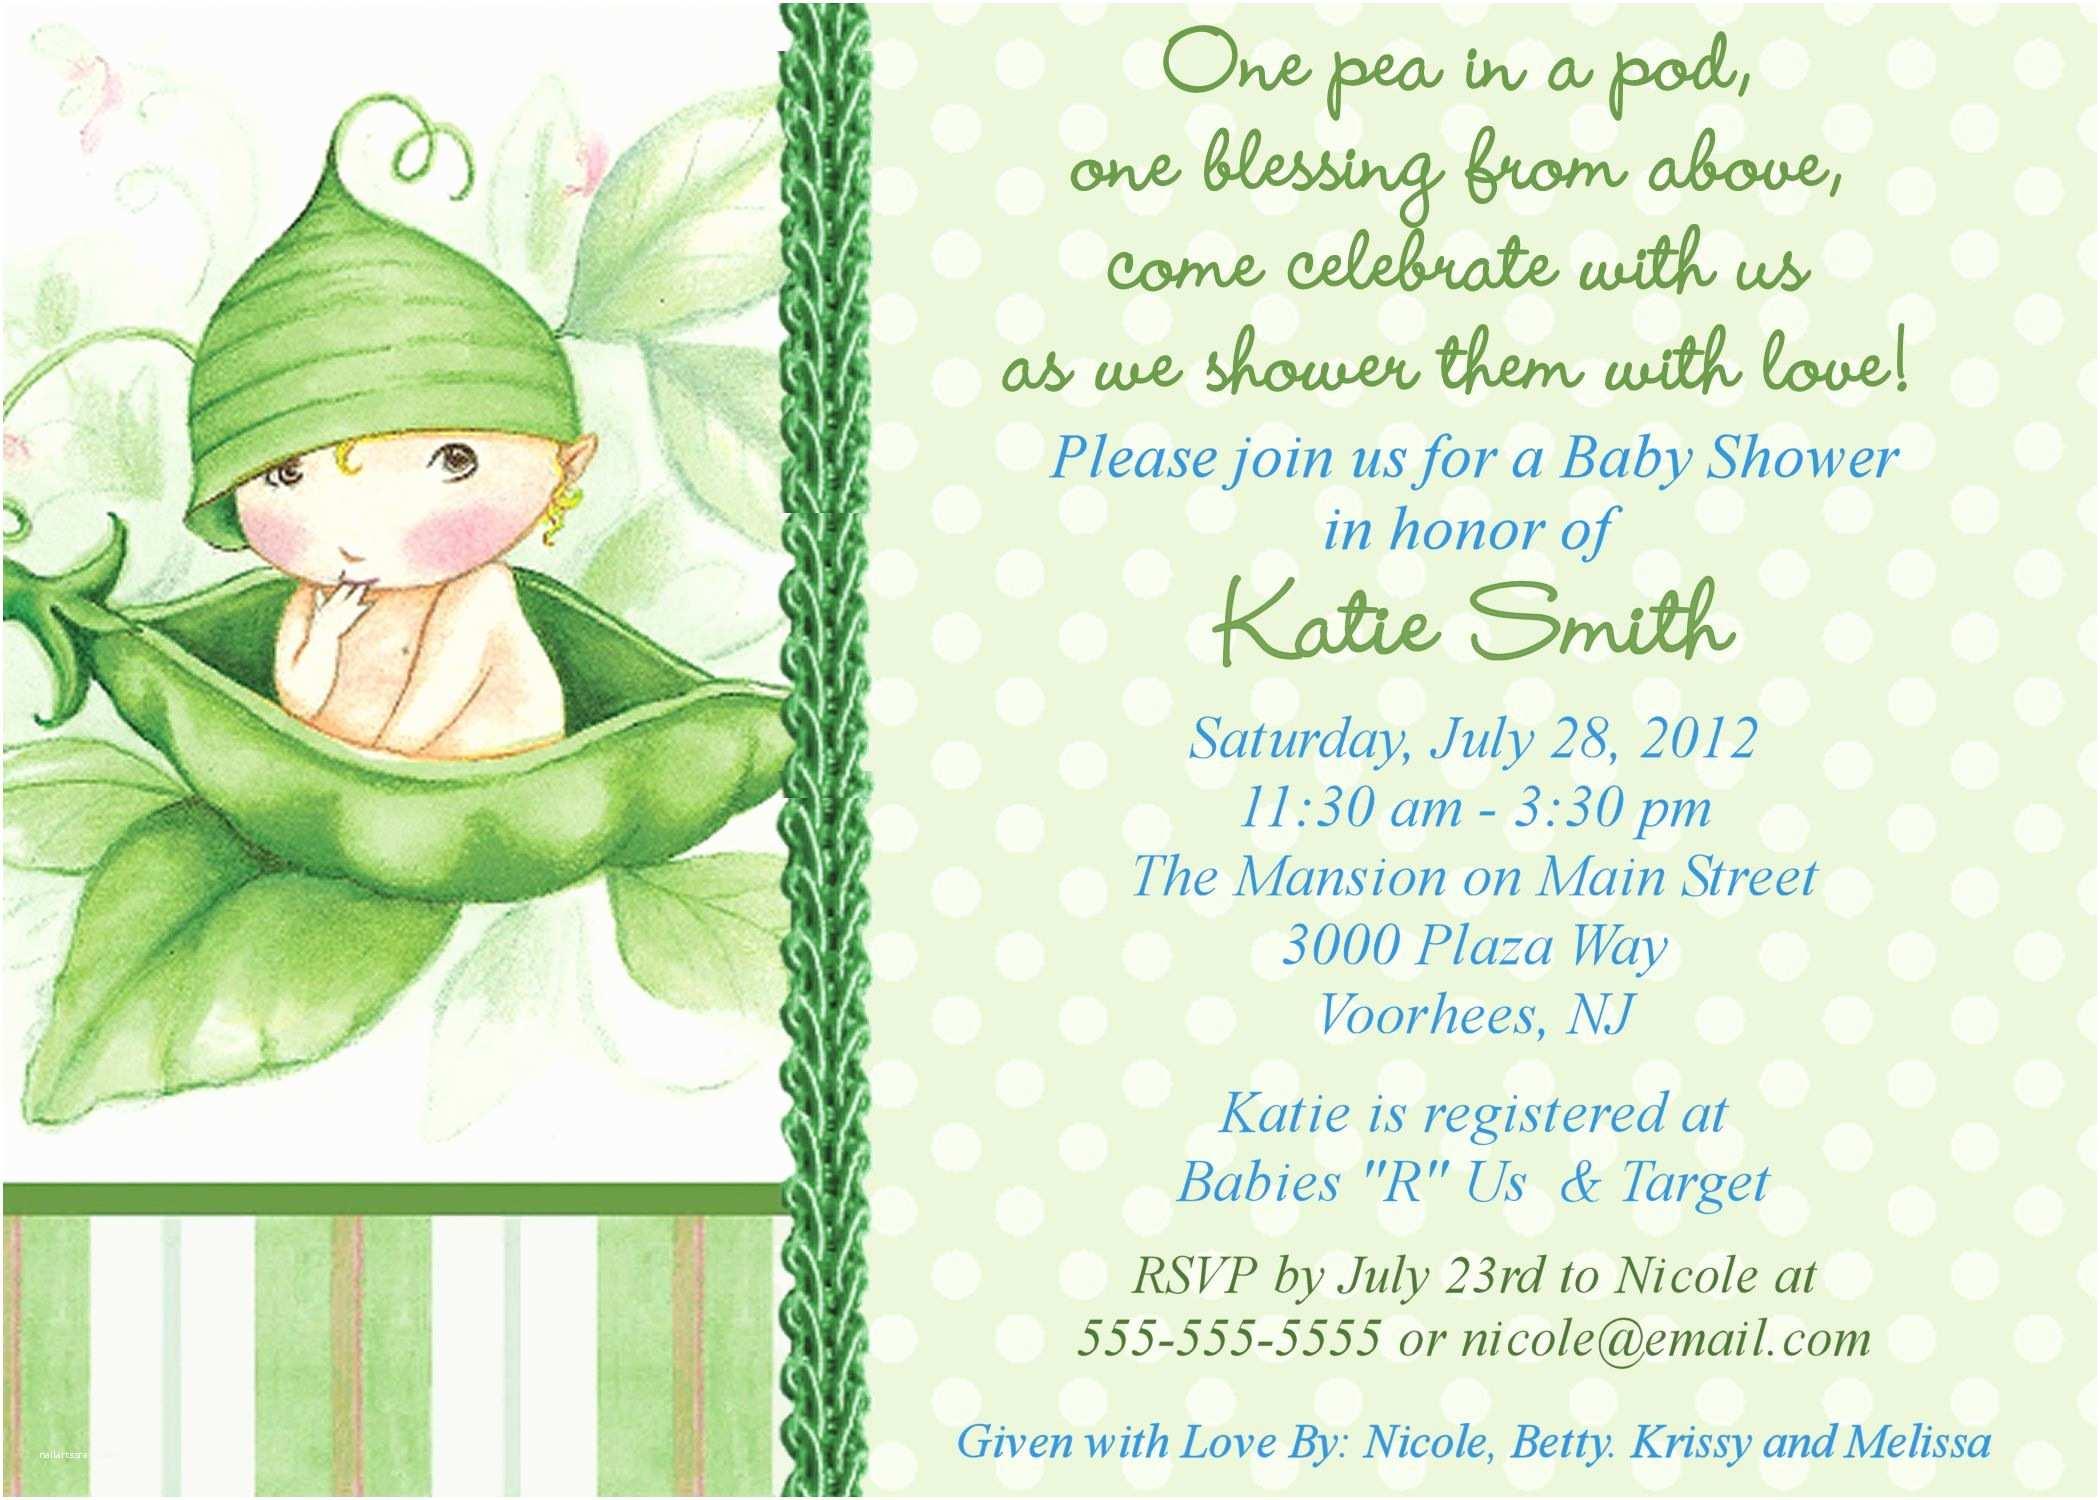 Baby Shower Invitation Templates Free Baby Shower Invitation Free Baby Shower Invitation